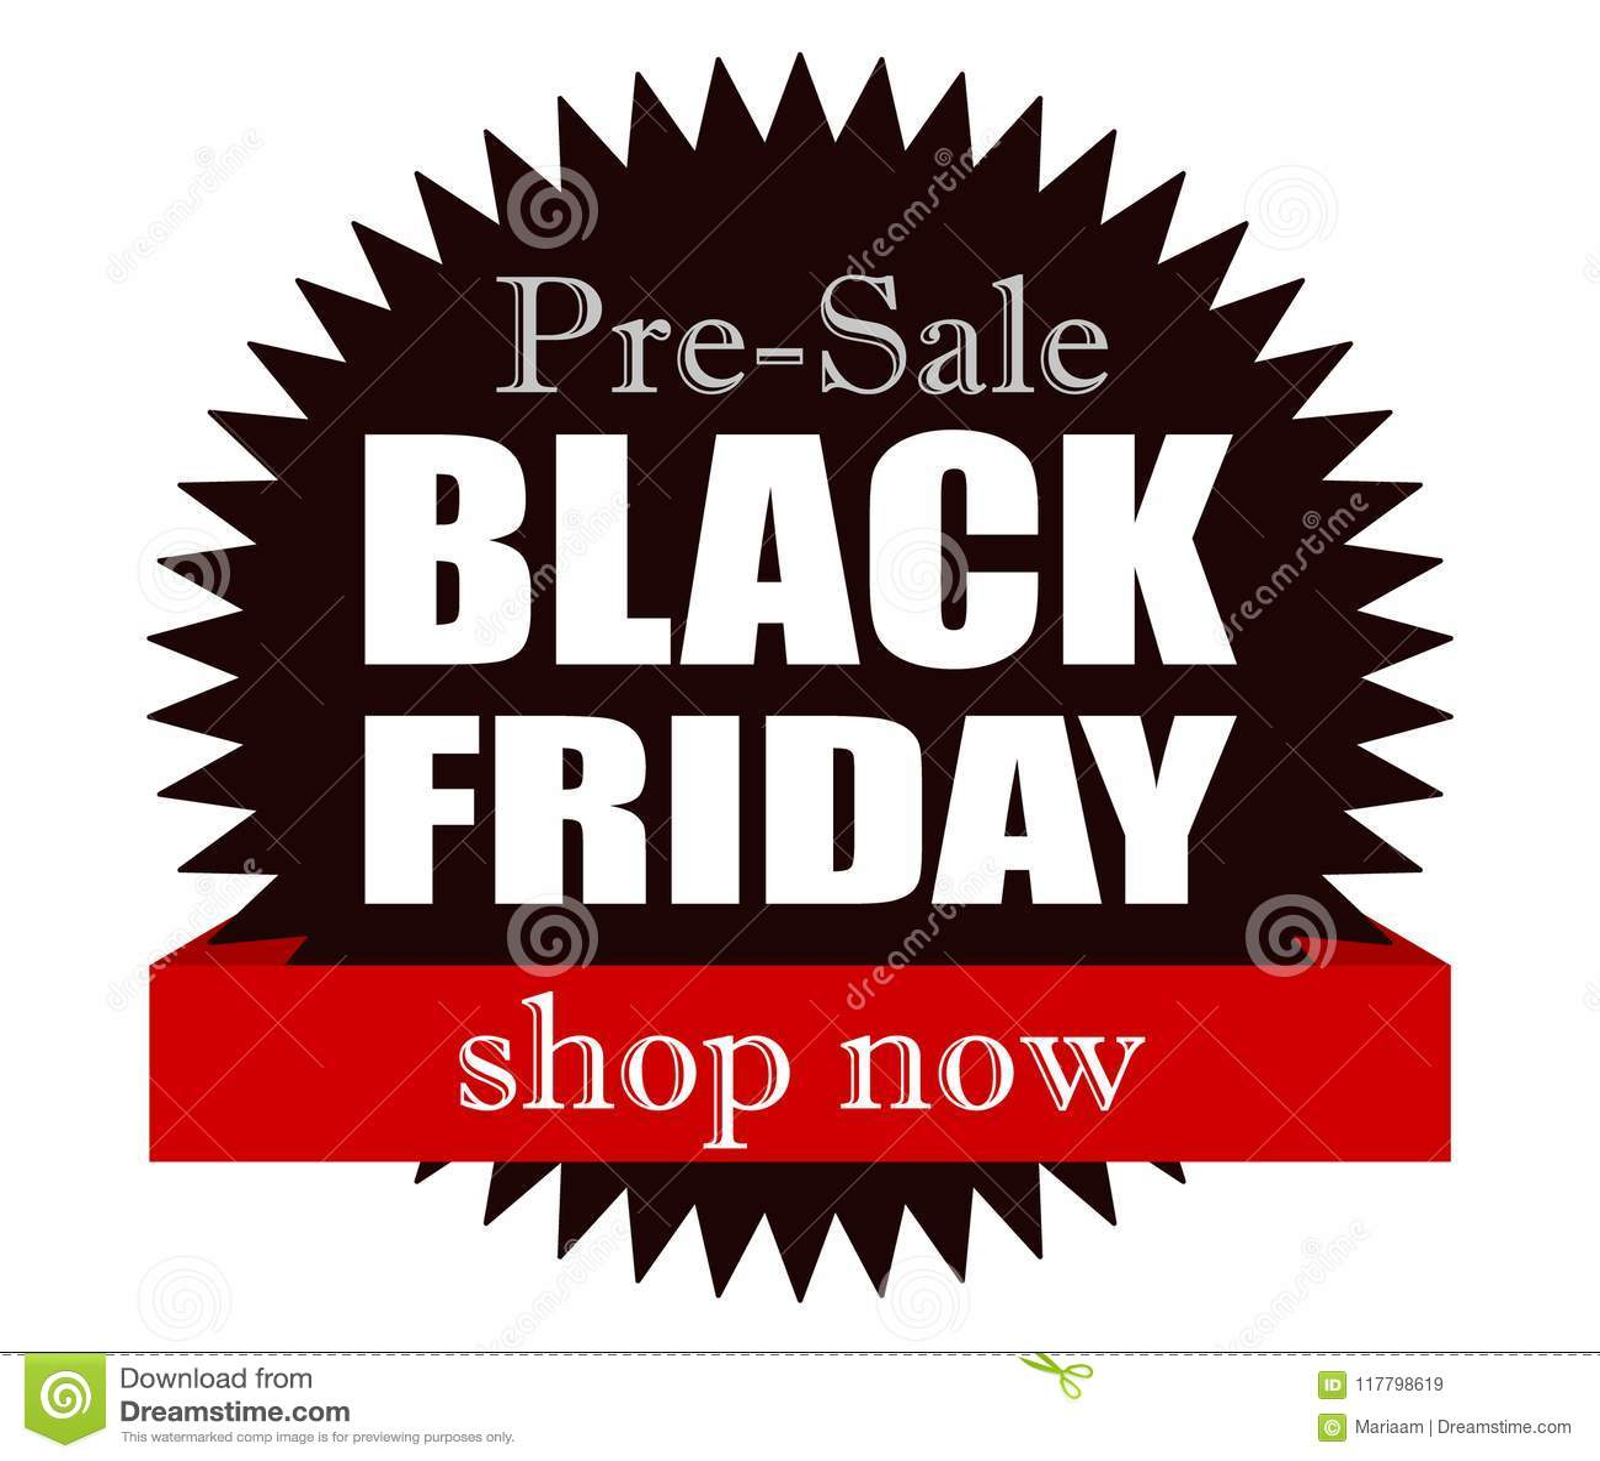 043e4affd8 Black Friday Pre-sale! Shop Now. Stock Vector - Illustration of ...